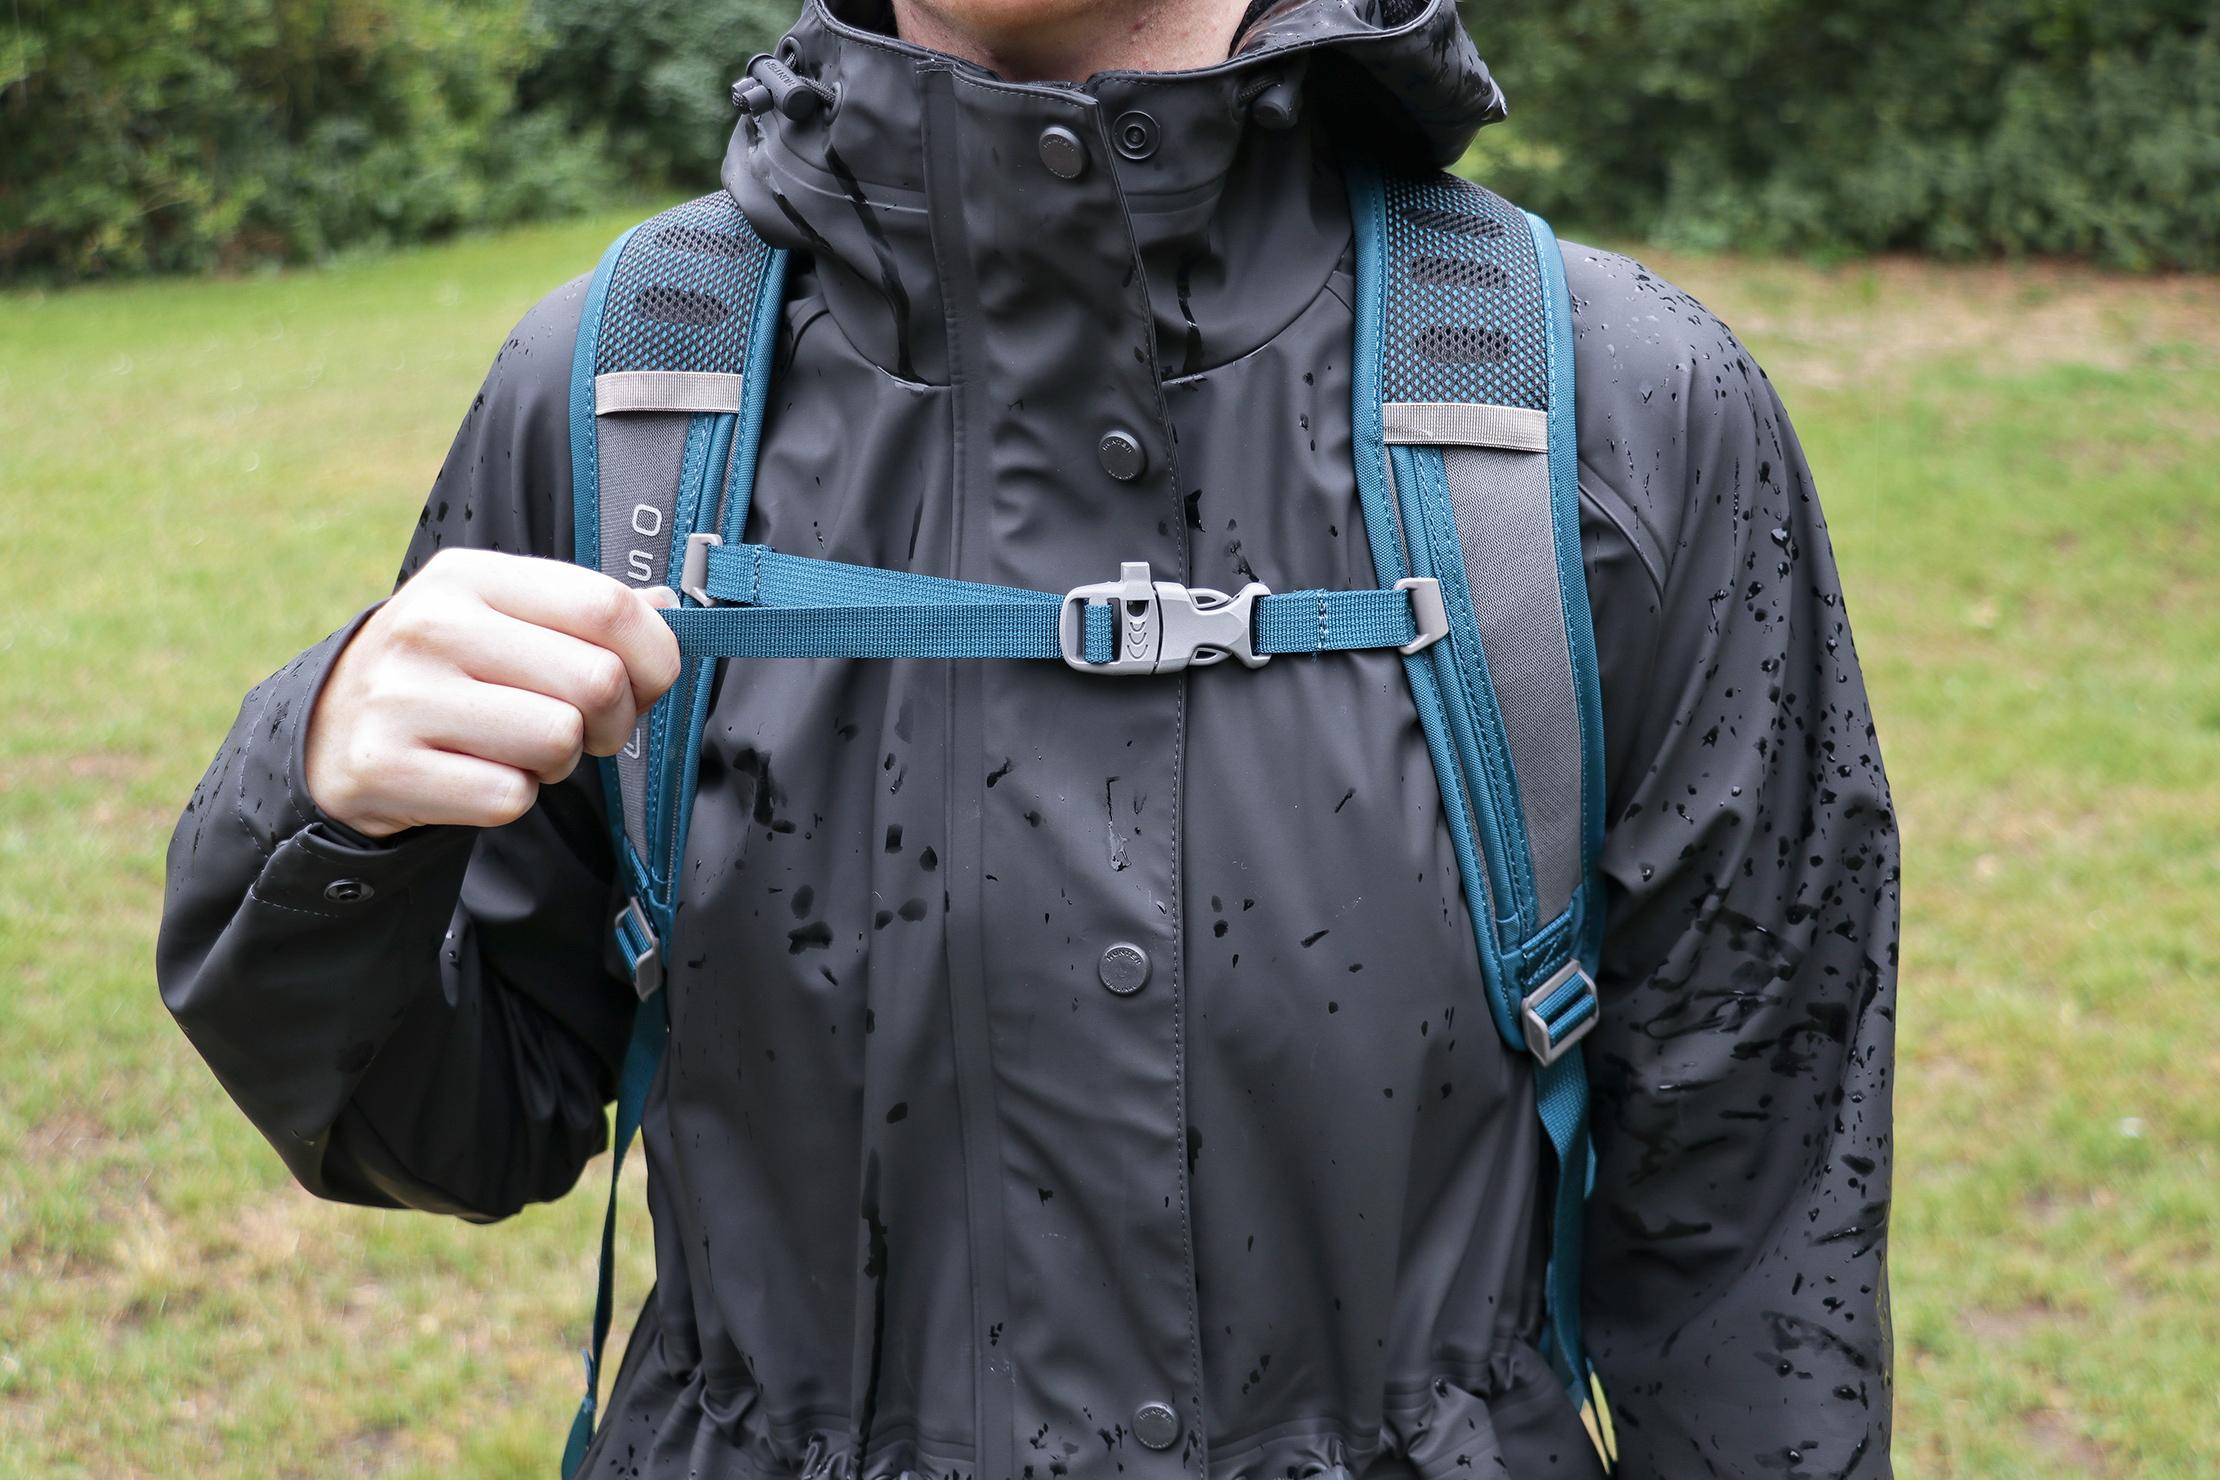 Osprey Daylite Travel Pack Sternum Strap